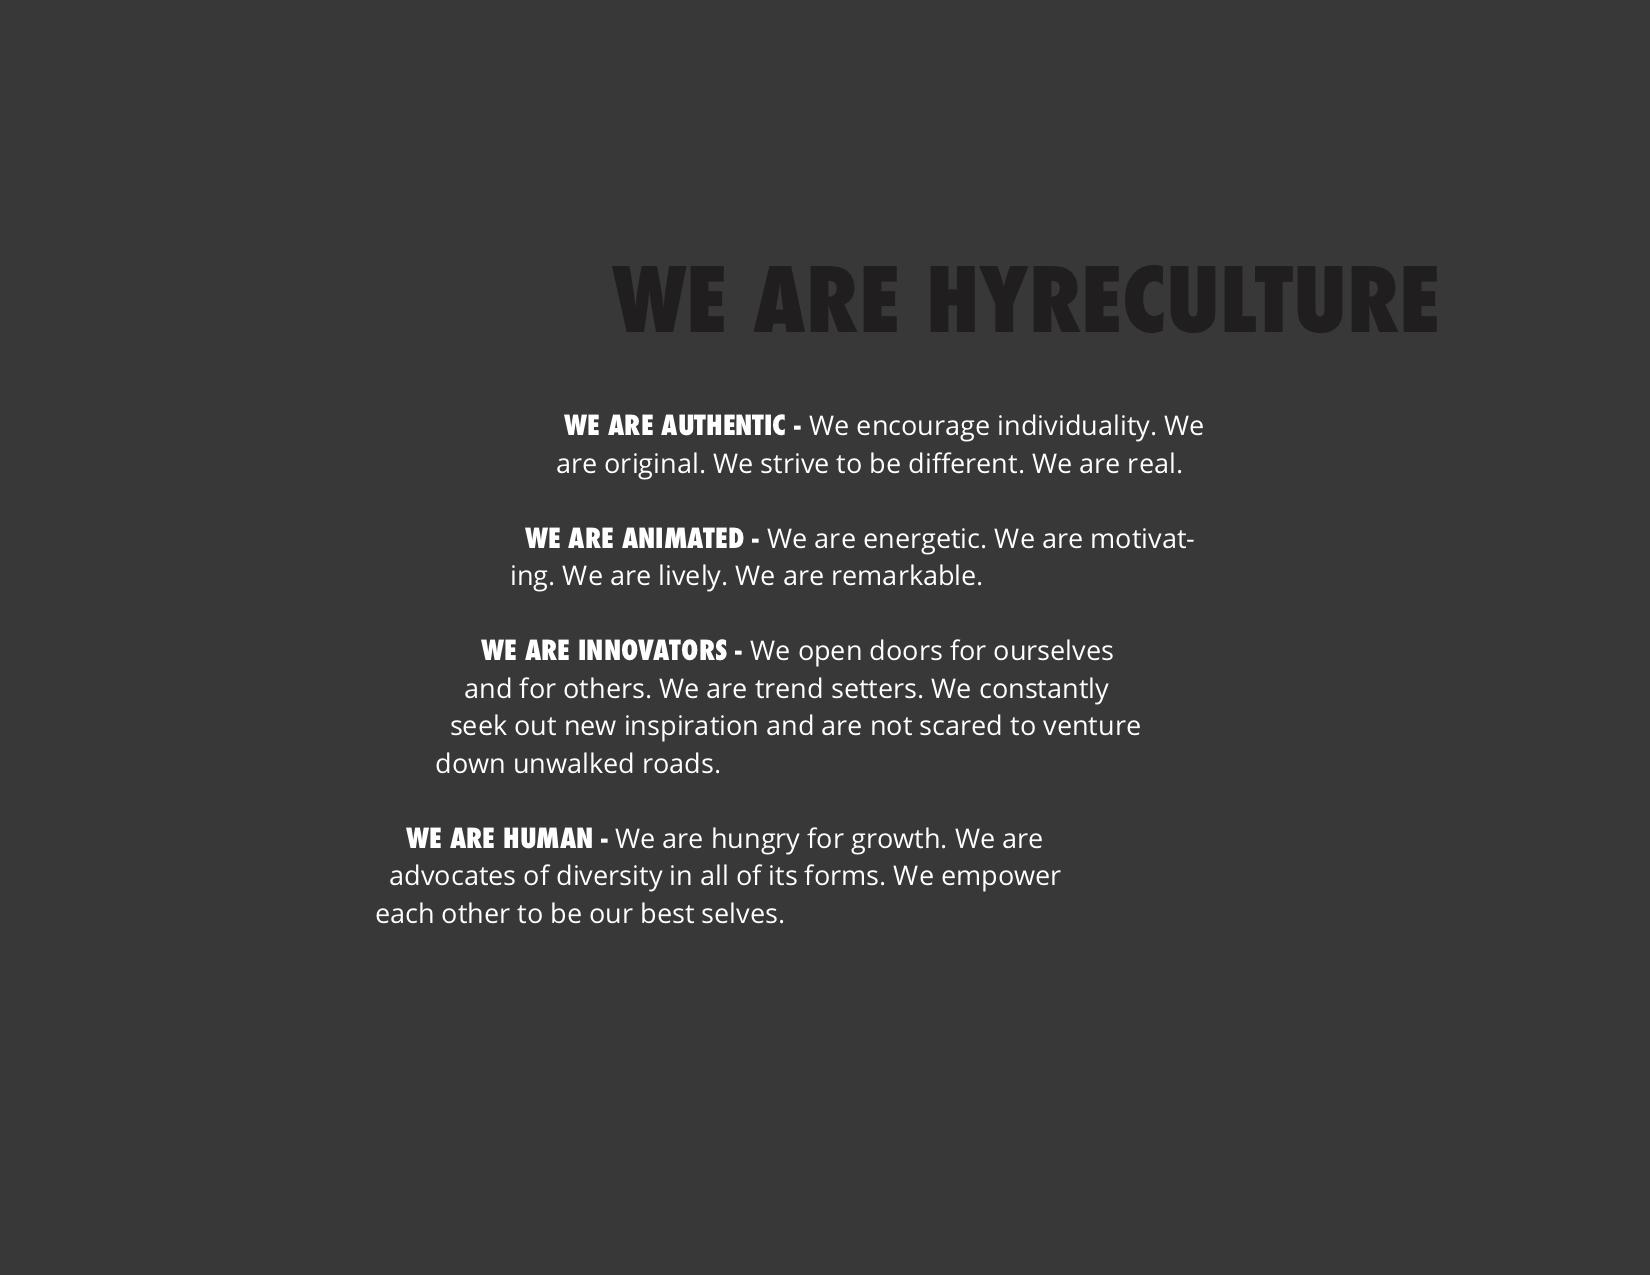 17-HyreCulture-BrandDeck-Who-we-are.jpg